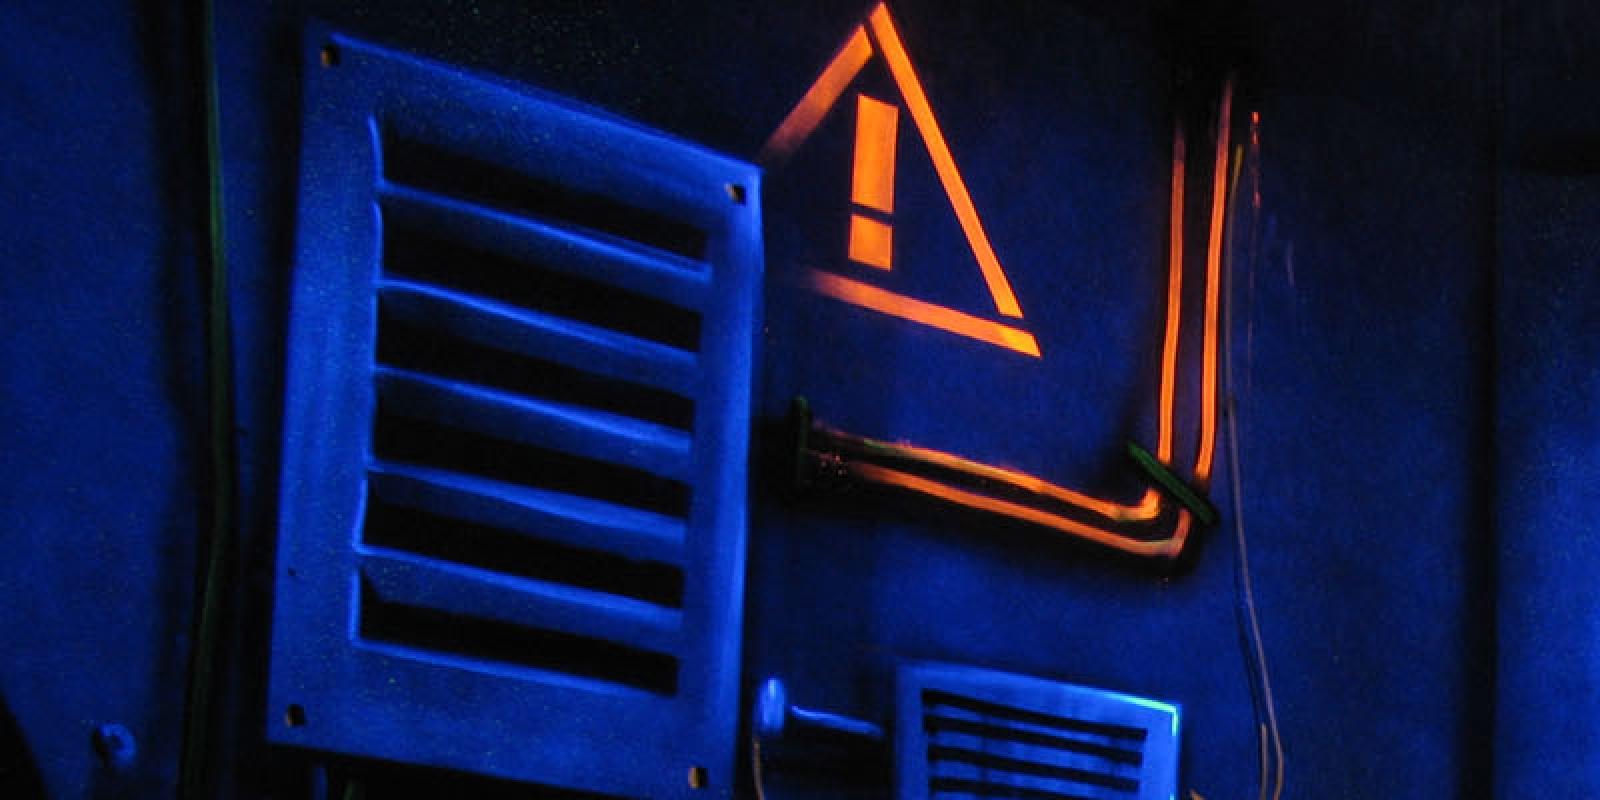 Photo d'ambiance du Laser game Herblay, lumière tamisée